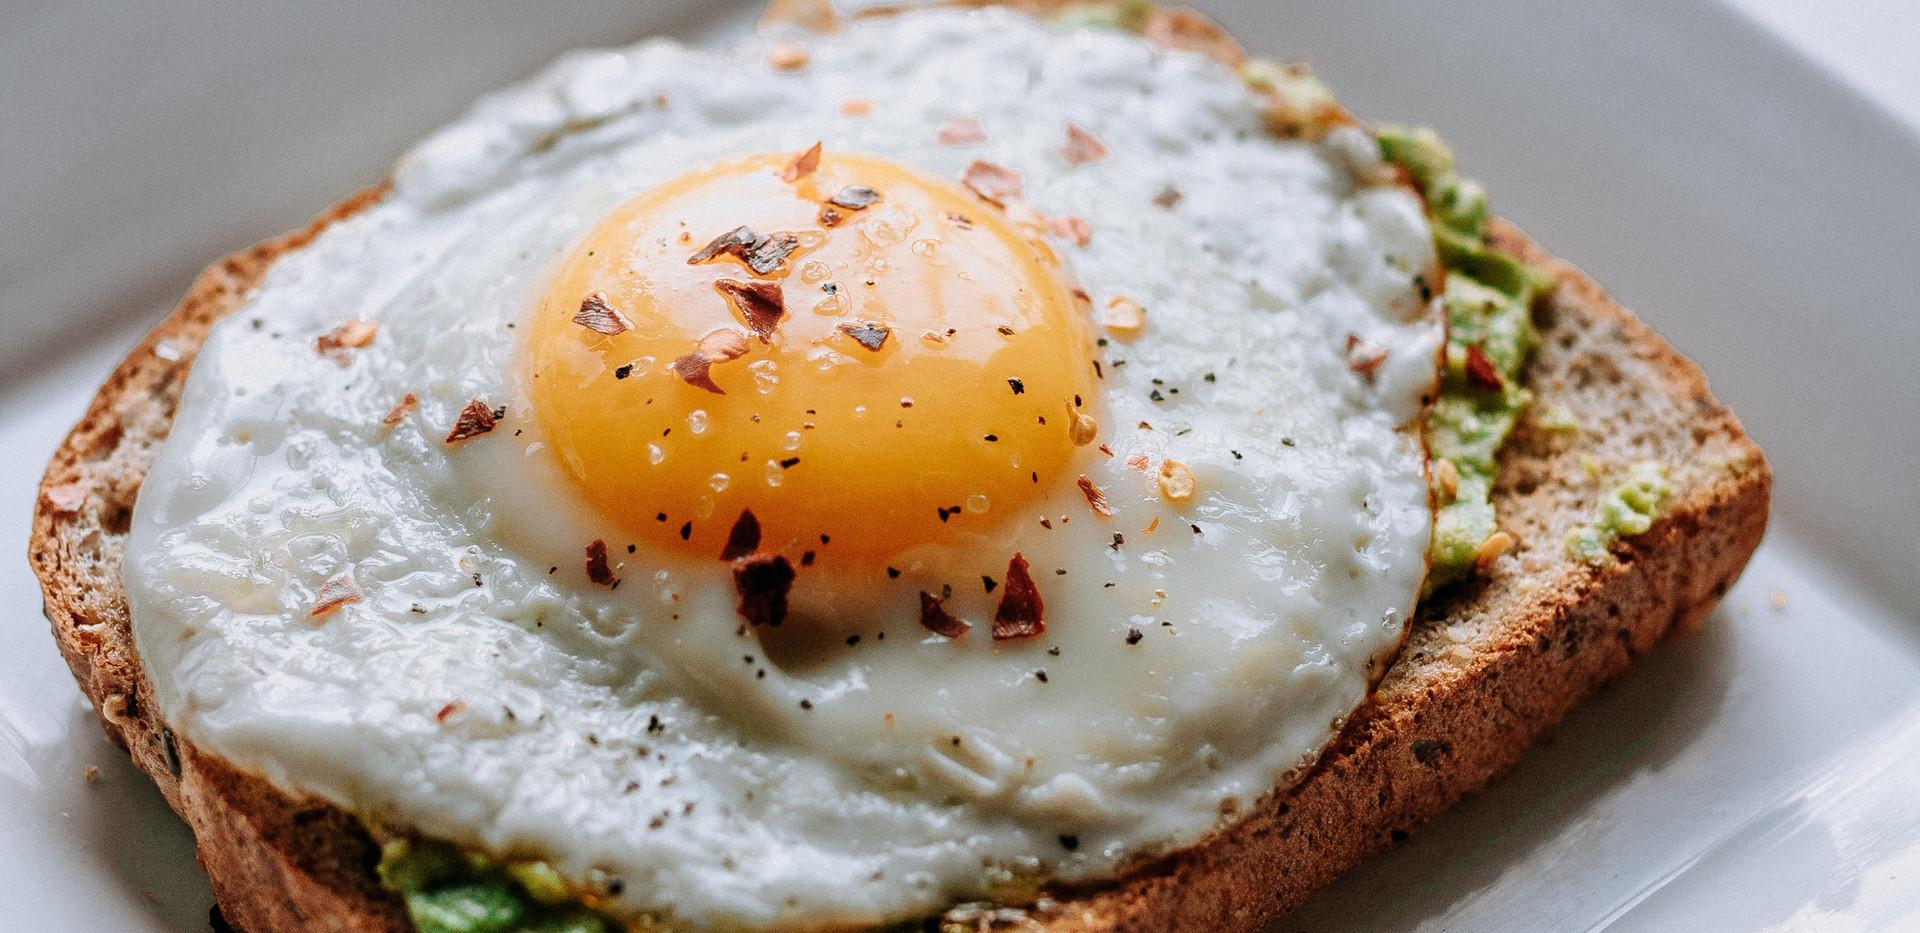 Breakfast: Avocado Toast